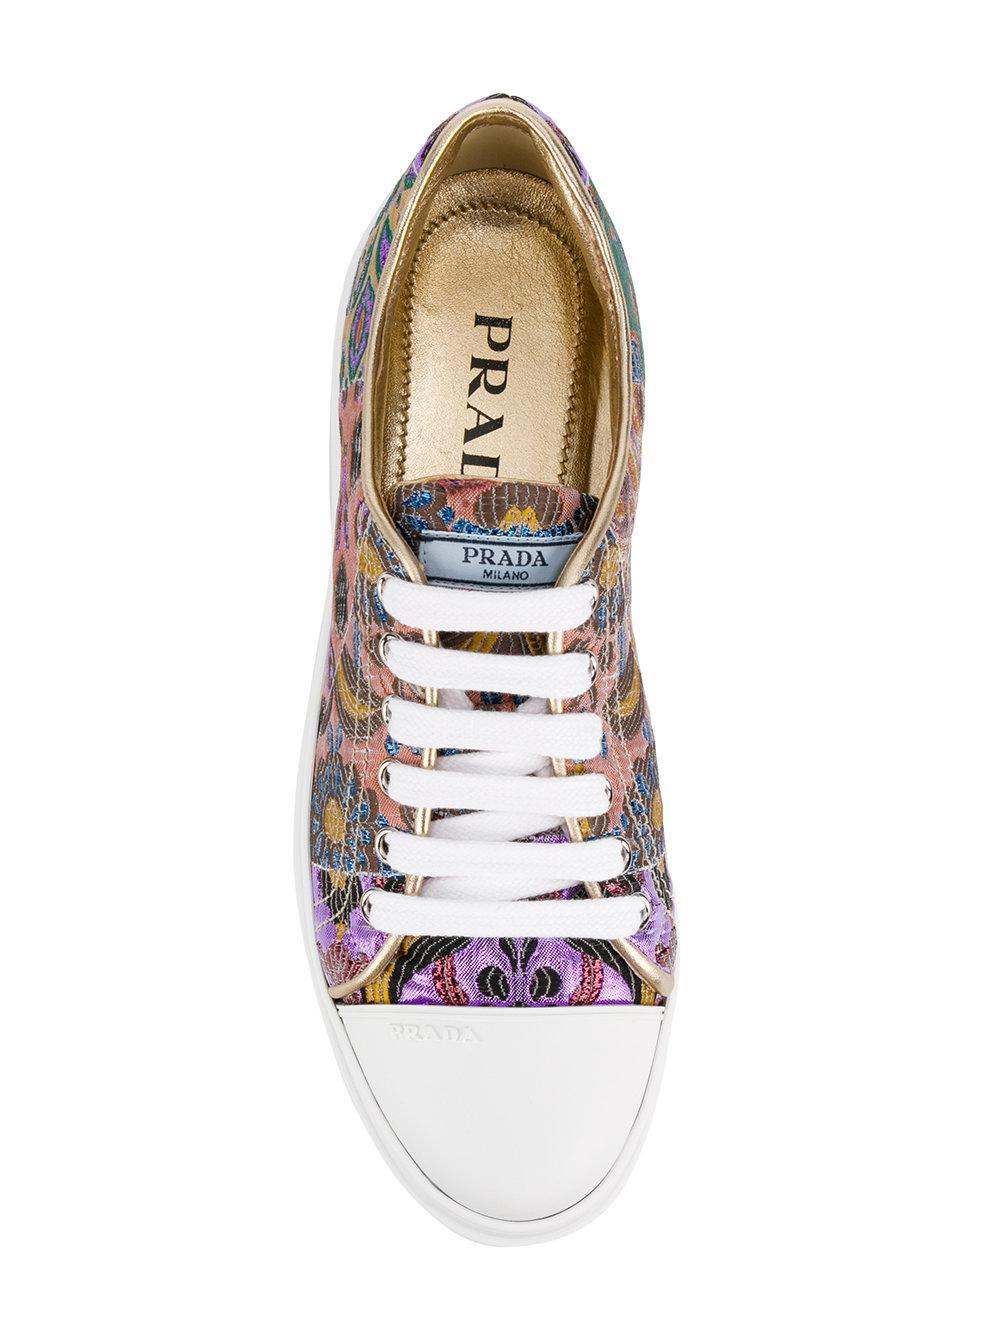 Prada Leather Platform Soled Sneakers